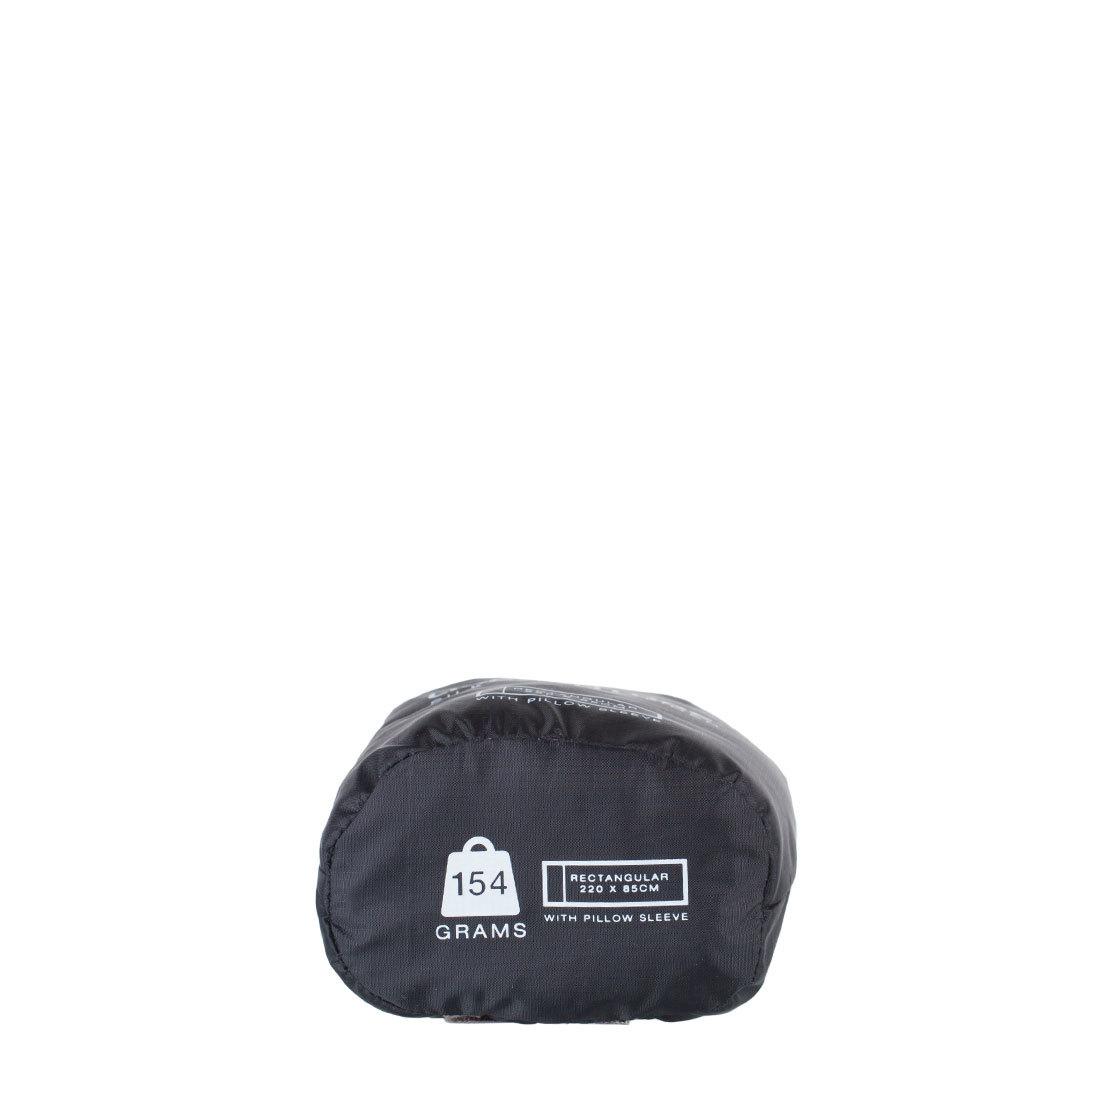 65660_silk-ultimate-sleeping-bag-liner-rectangular-3.jpg